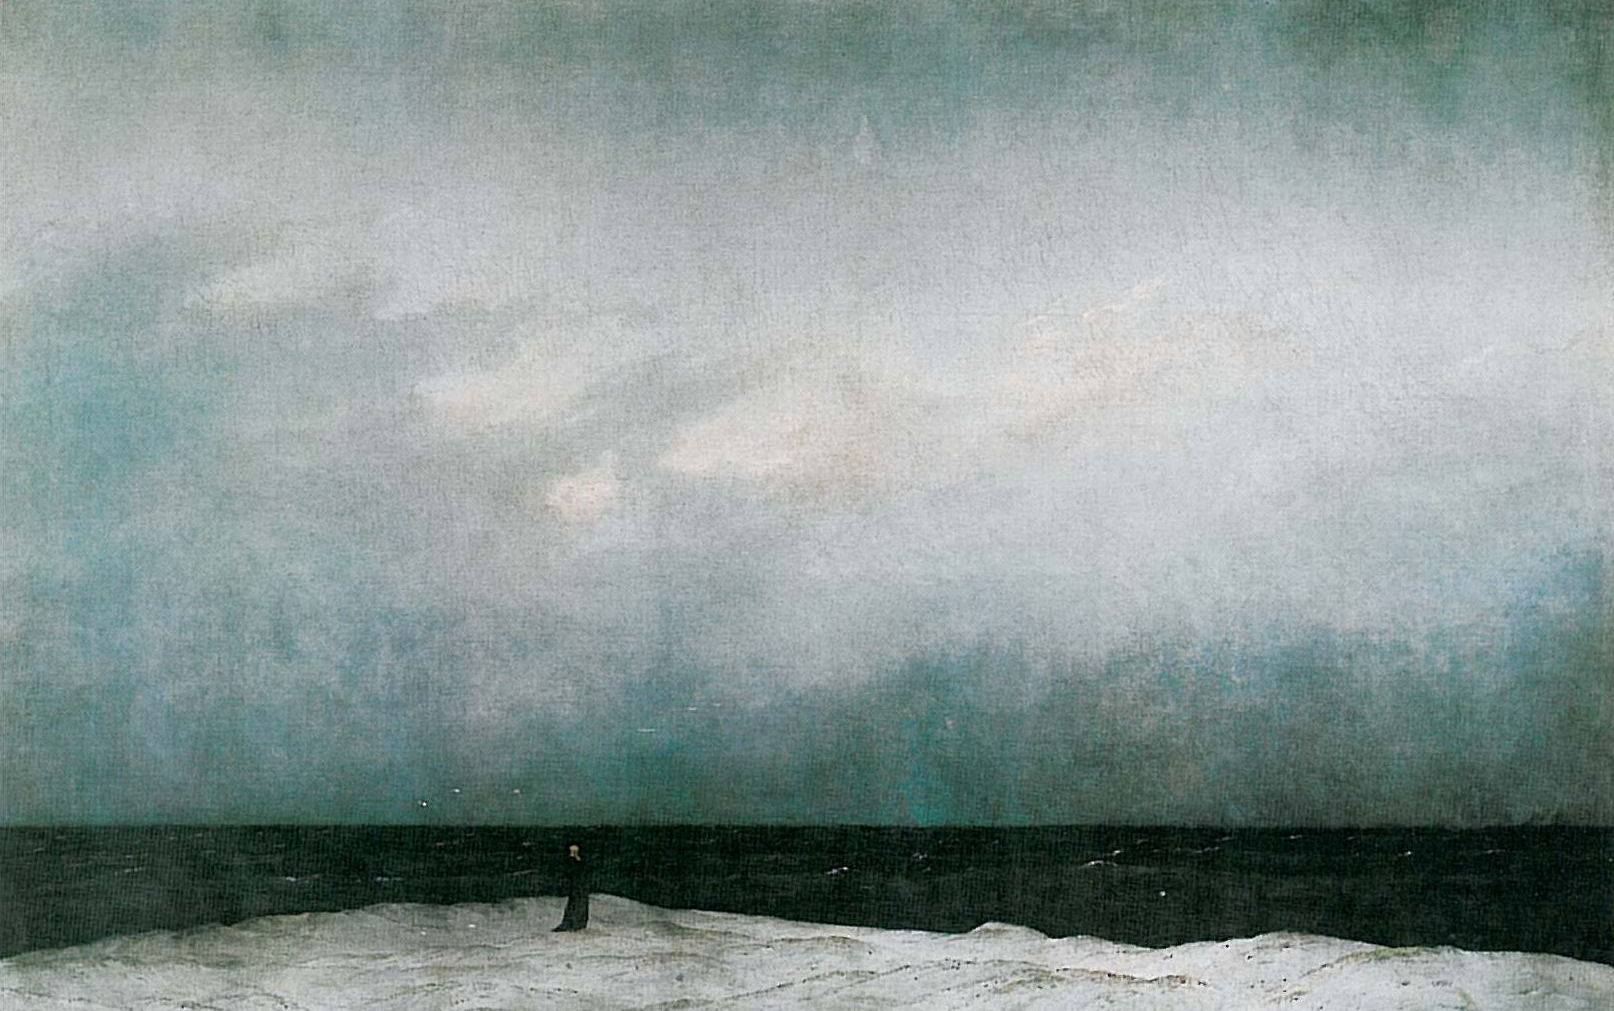 """Der Moench am Meer"" (C.D. Friedrich) (źródło: materiały prasowe organizatora)"